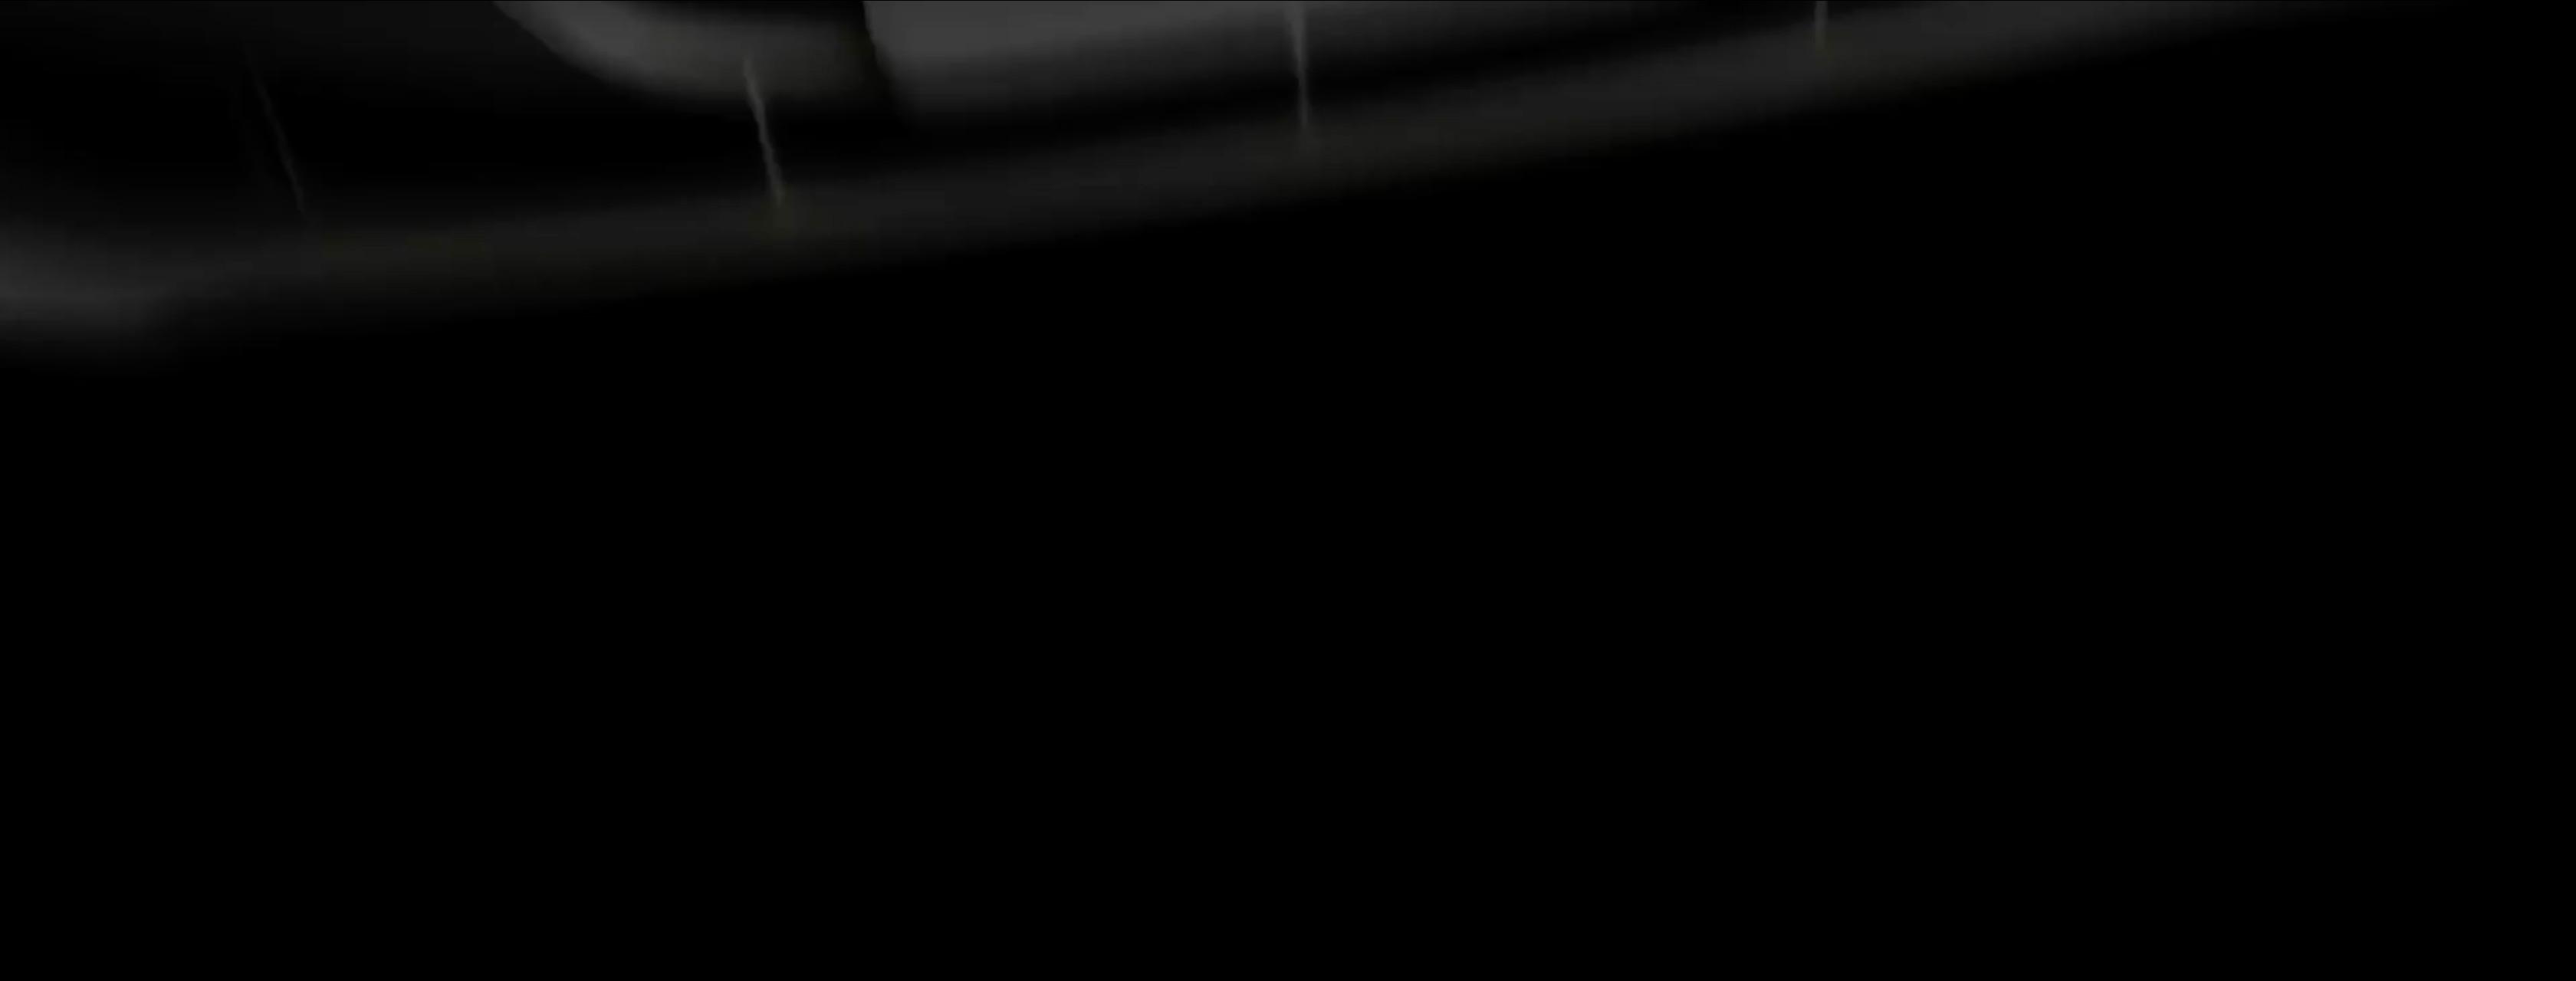 2018 Nissan LEAF Electric Car | Room for 5 | Nissan USA